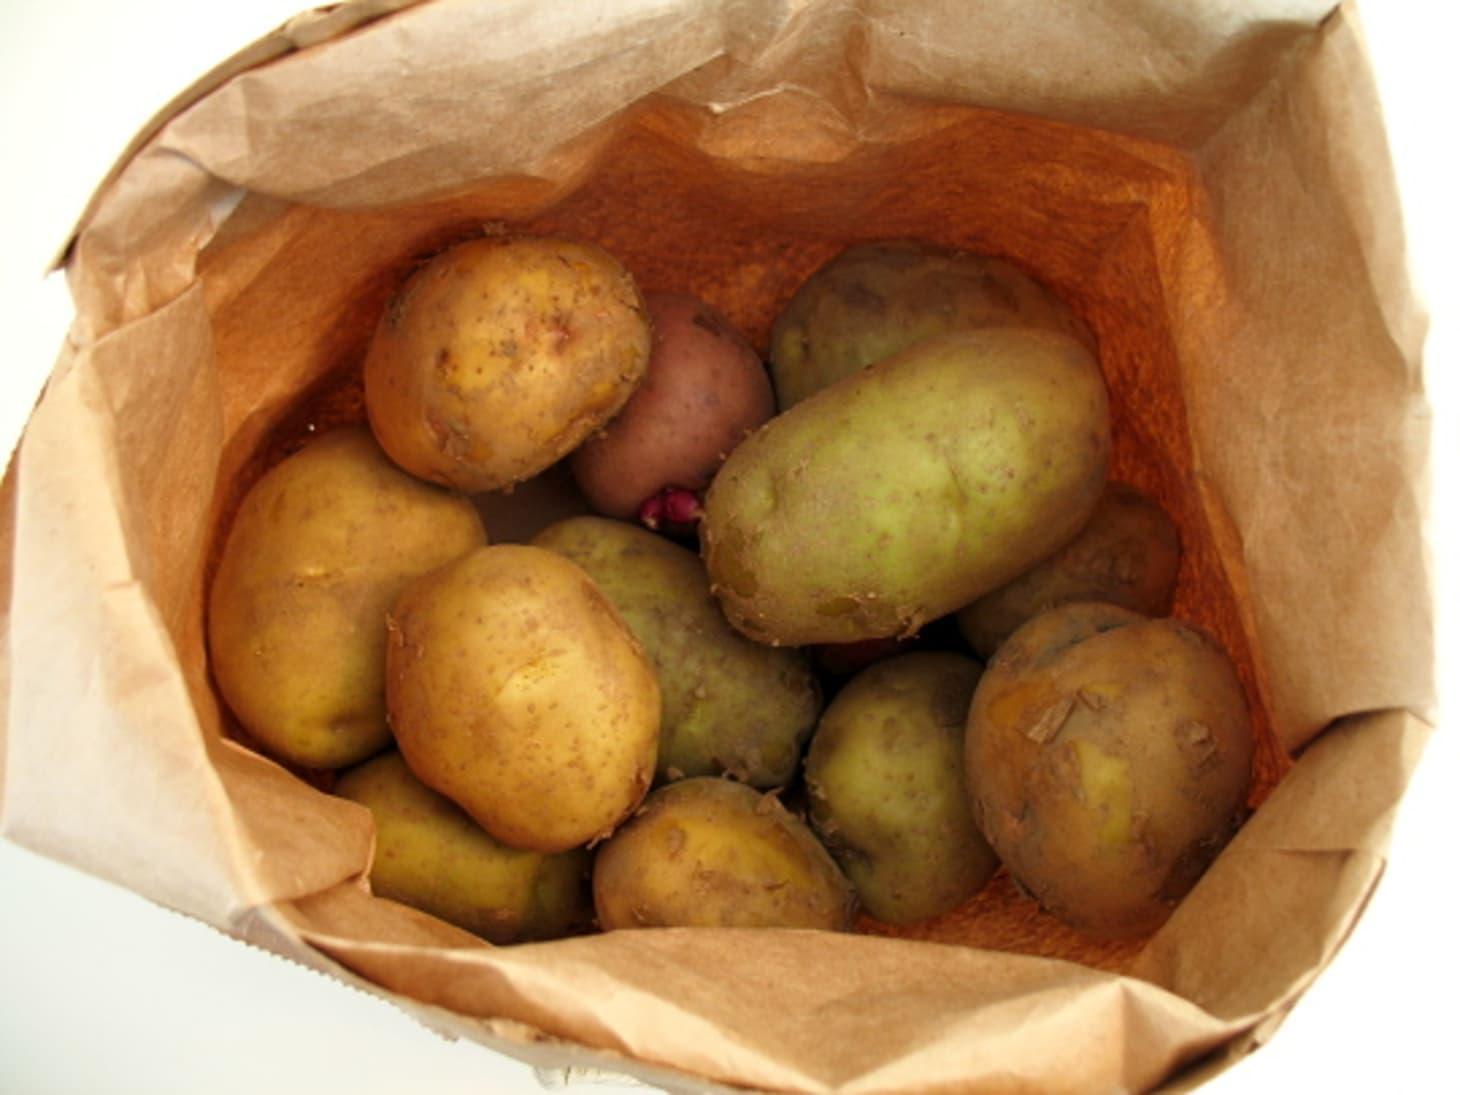 The Best Potatoes for Potato Salad | Kitchn